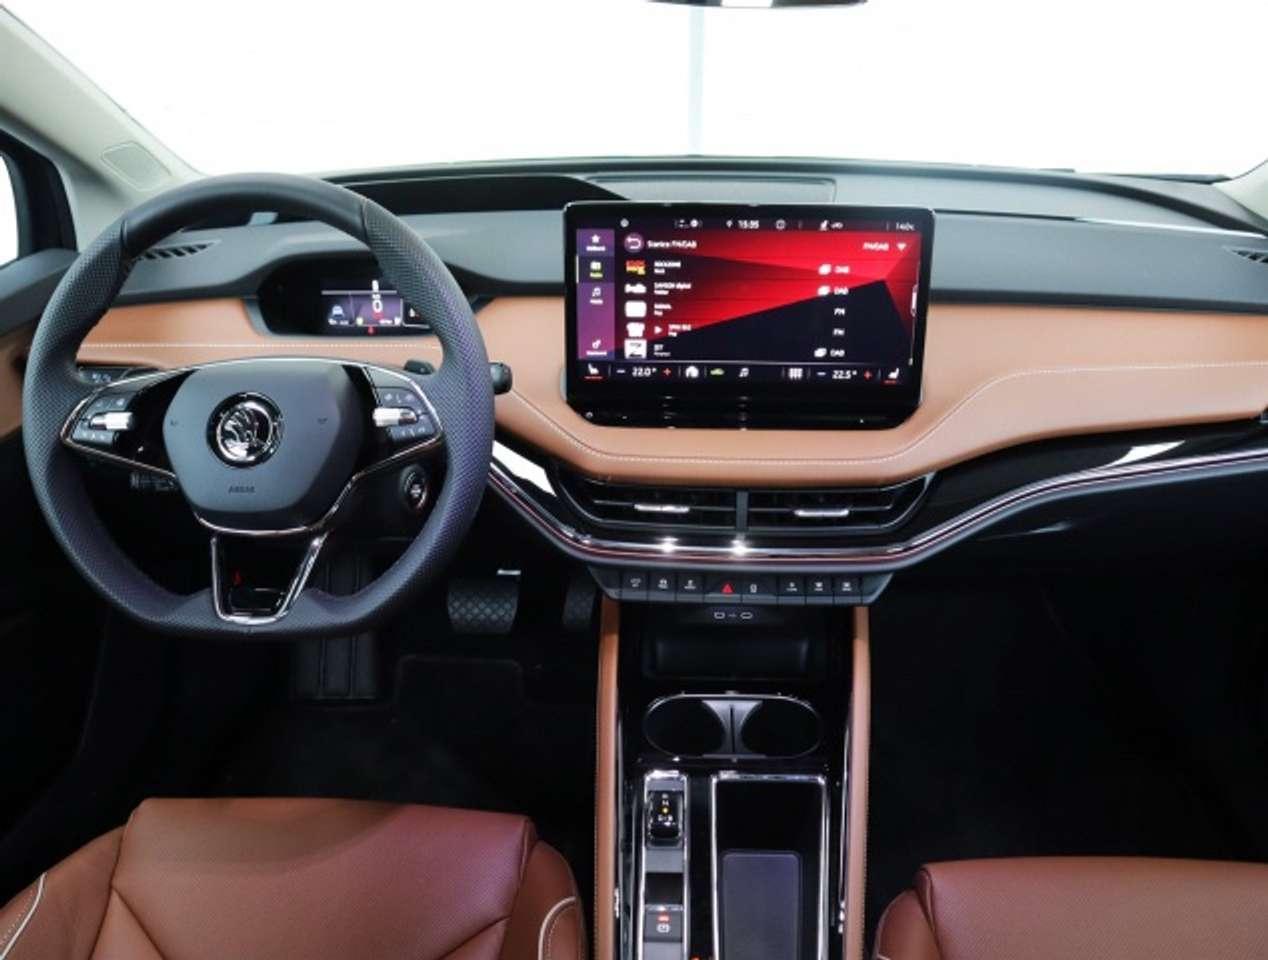 80 Eco-Suite iV GARANTIE bis 03/2026 od. 100000km